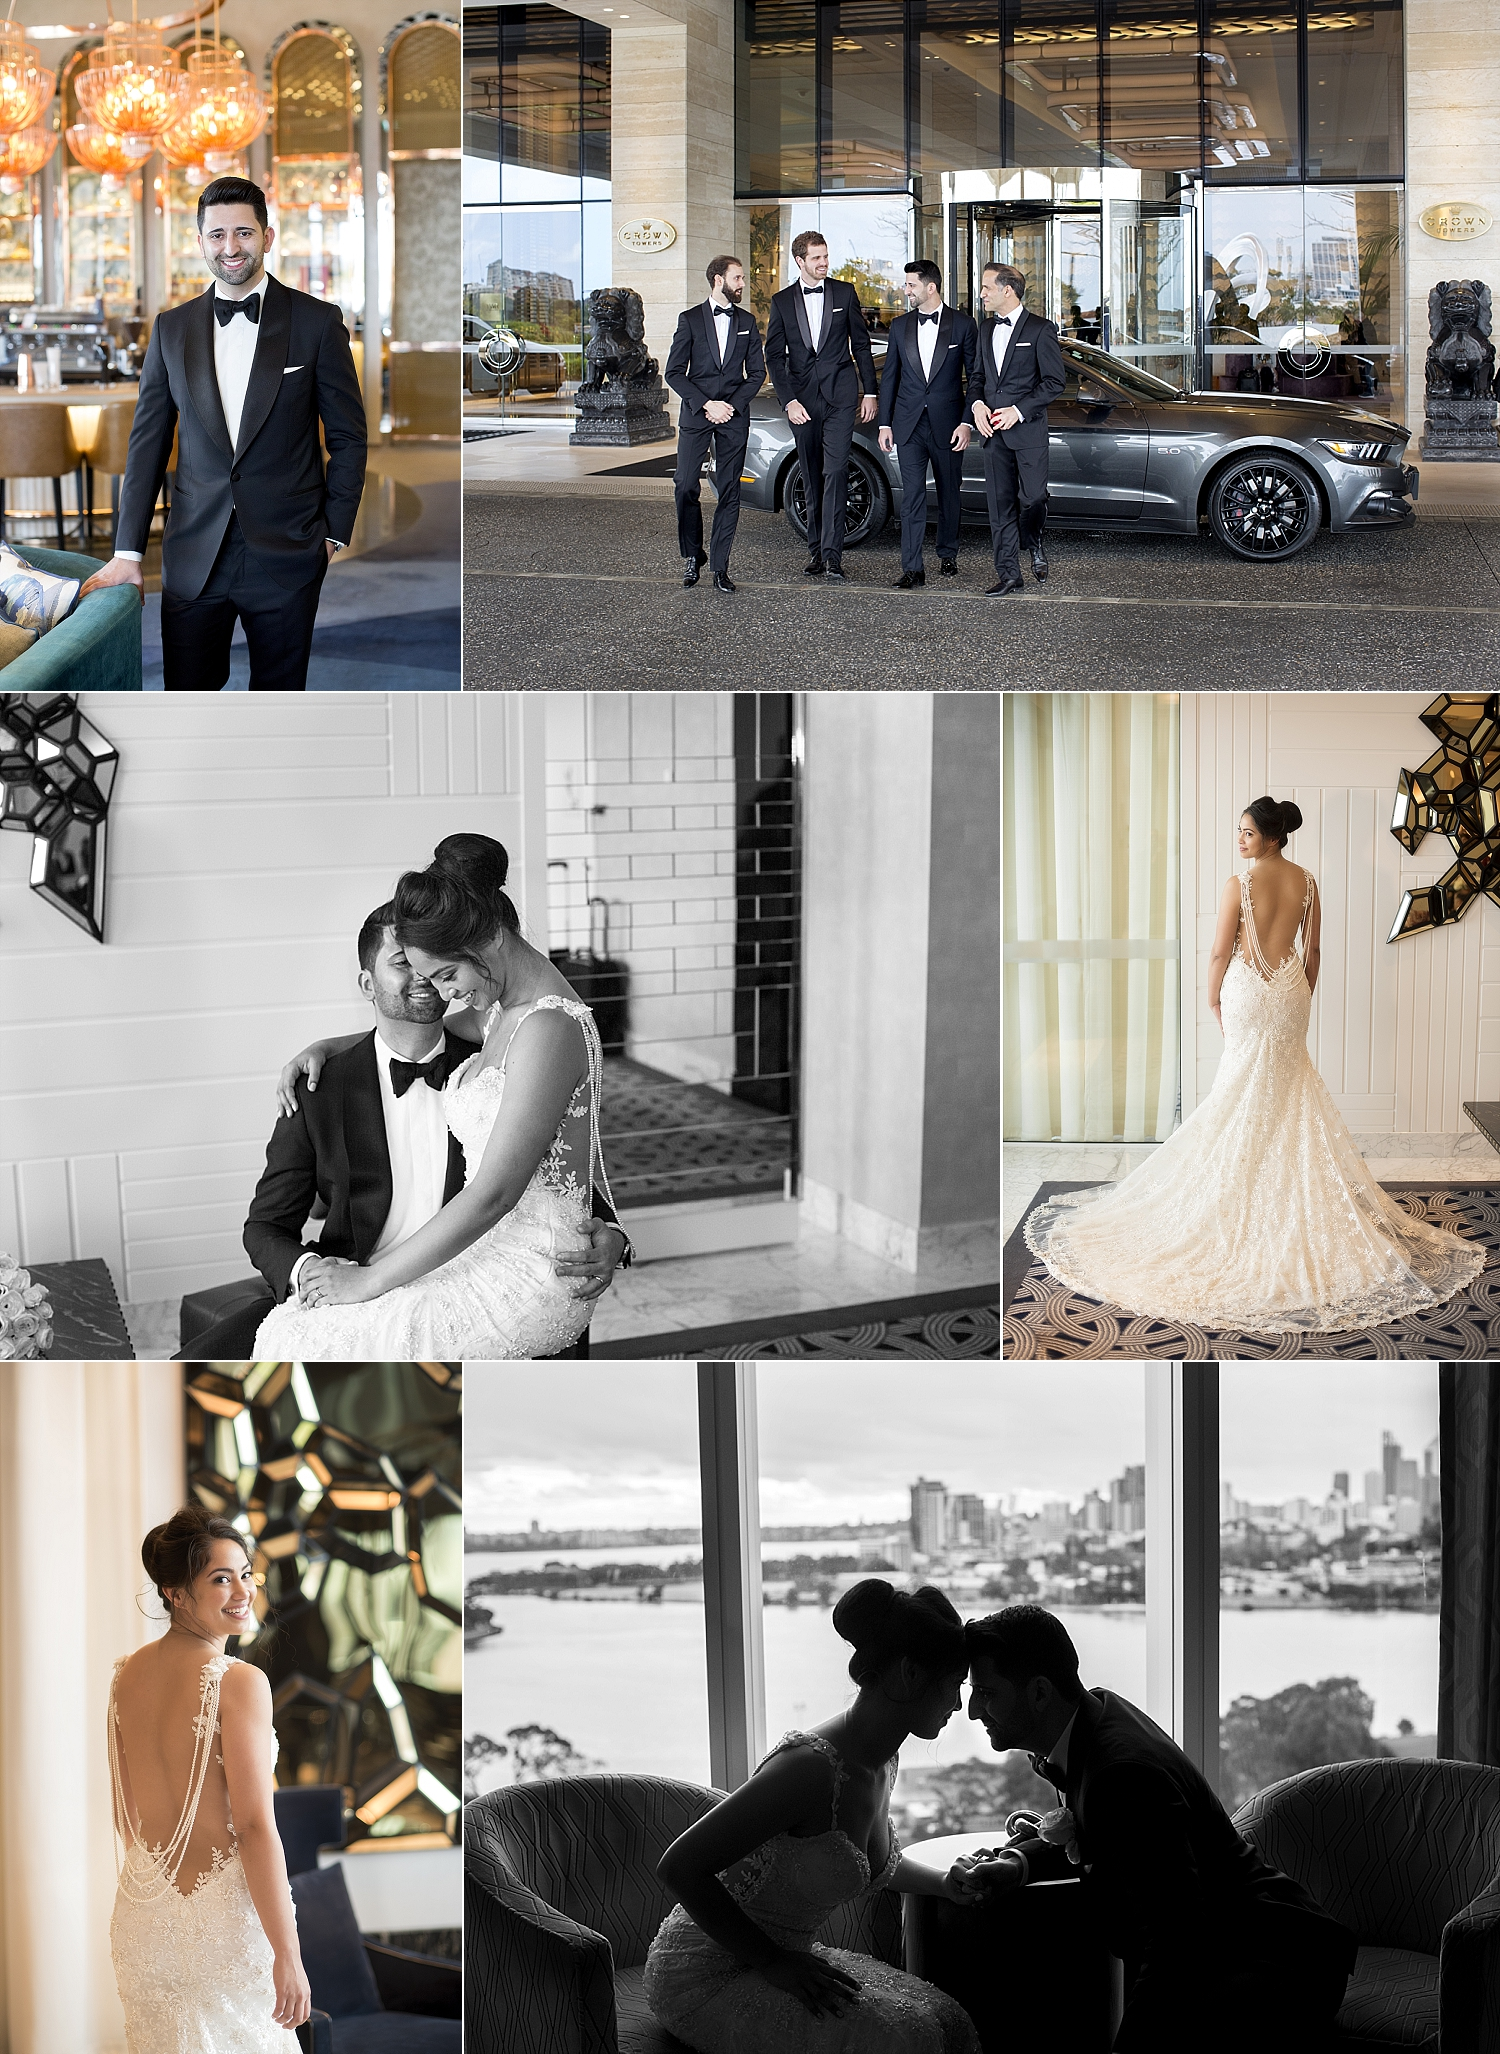 Crown Towers wedding photos Perth.jpg